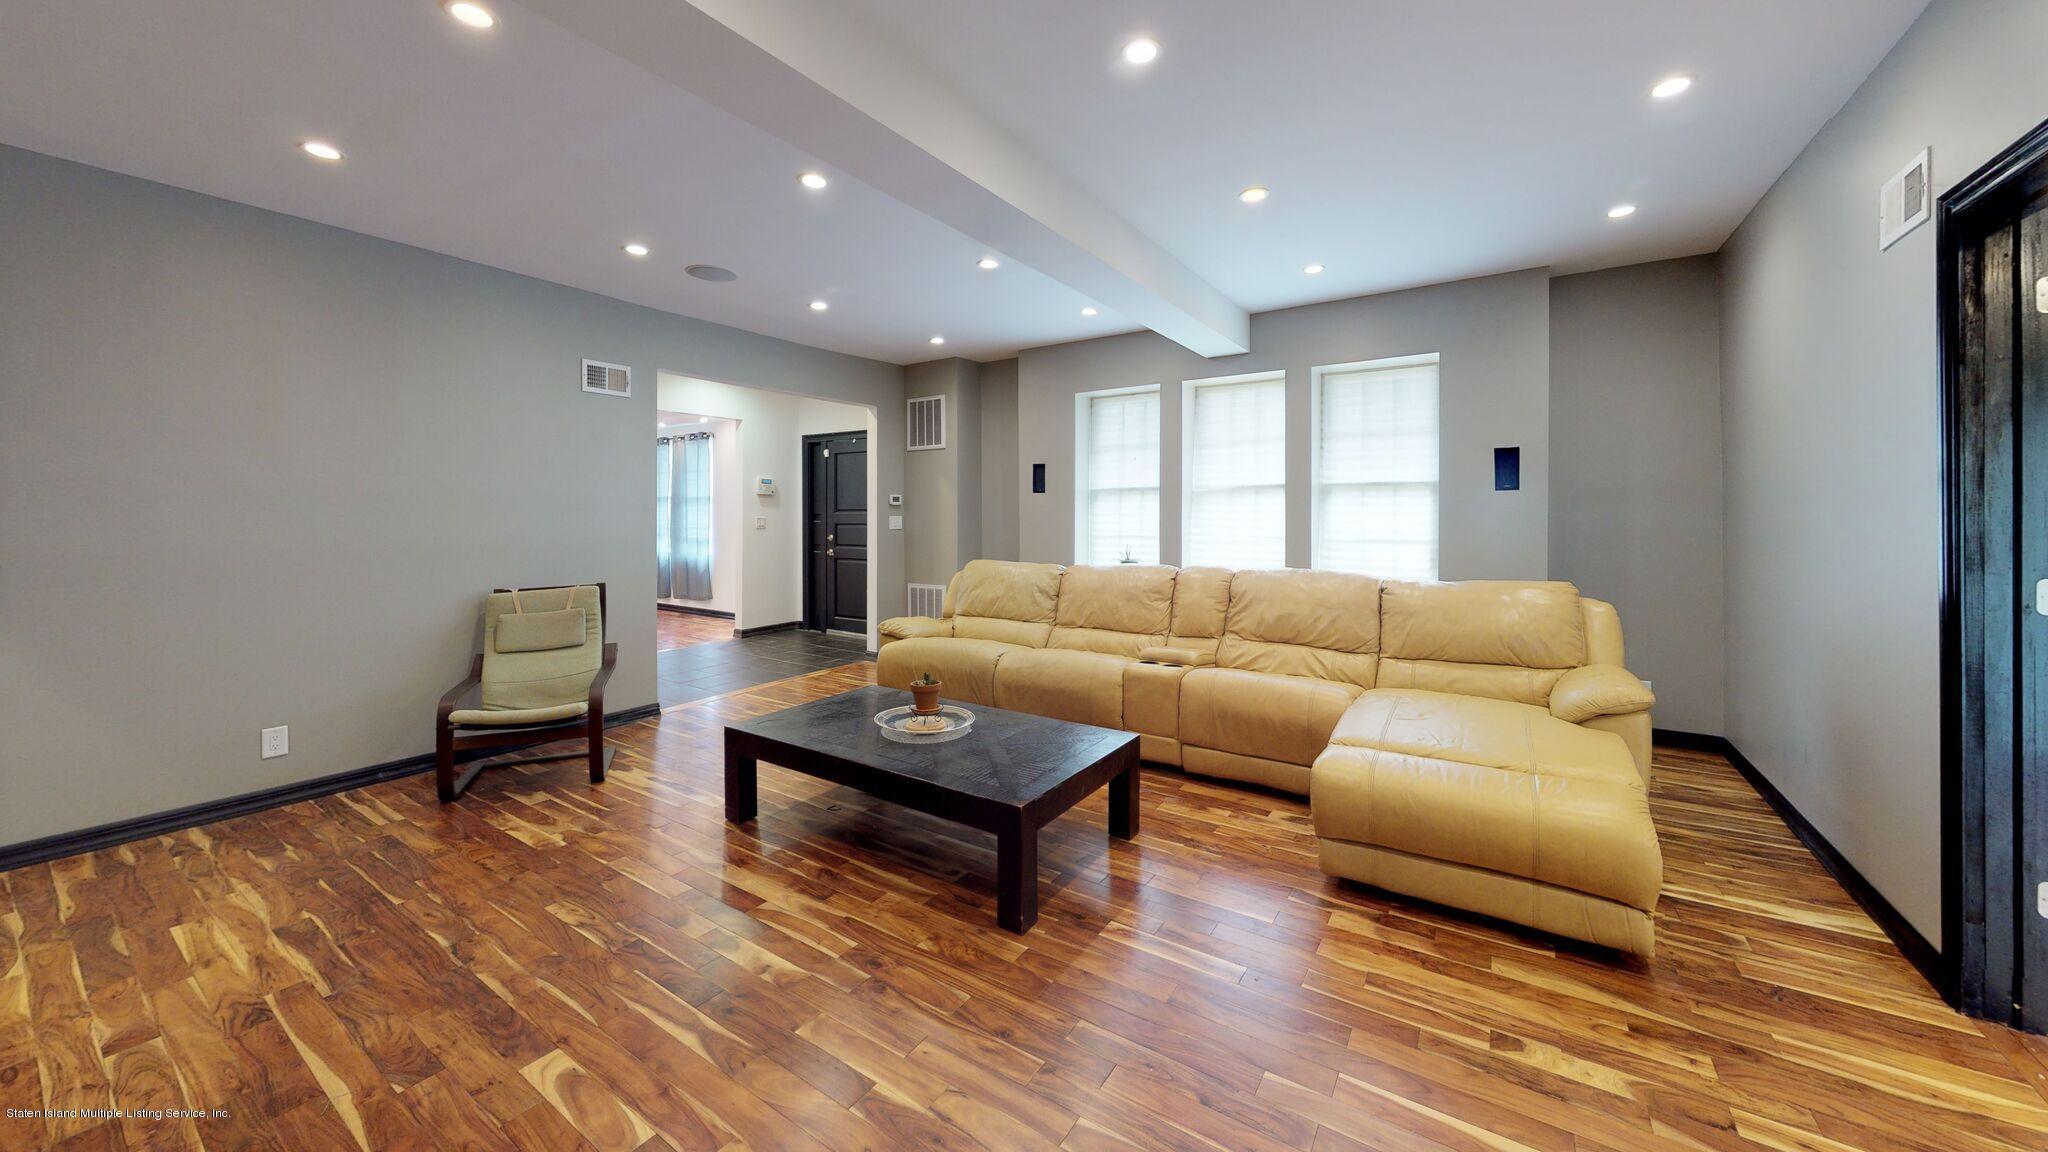 Single Family - Detached 128 Pelton Avenue  Staten Island, NY 10310, MLS-1124023-4